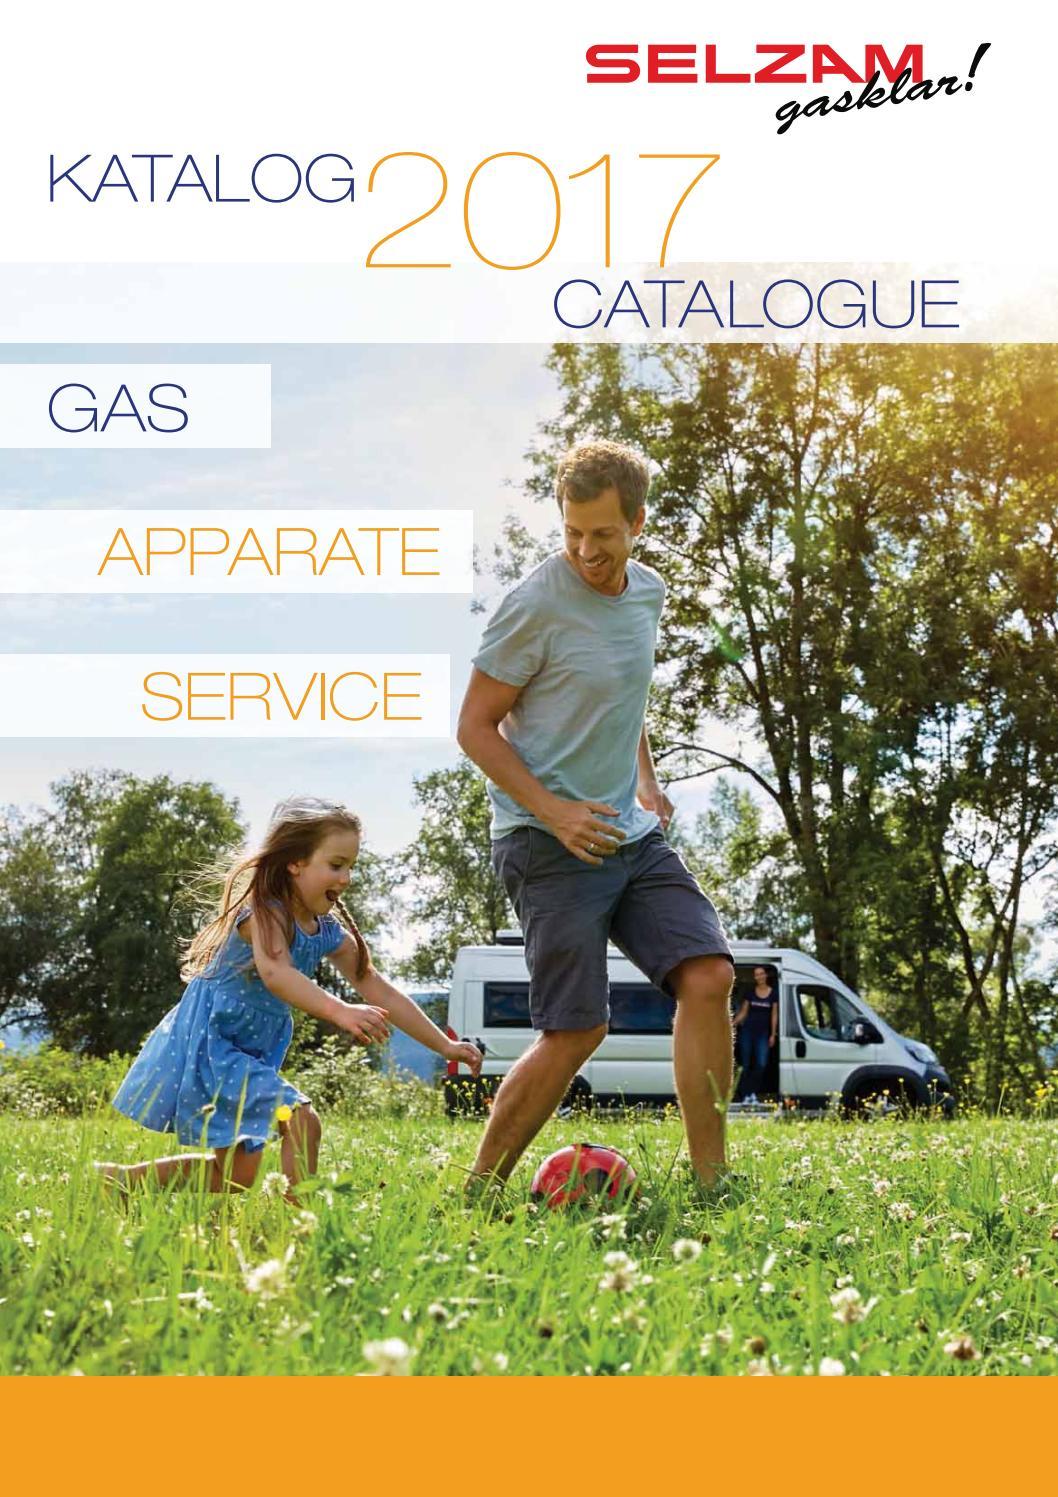 Selzam katalog 2017 by Landwirtshop - issuu